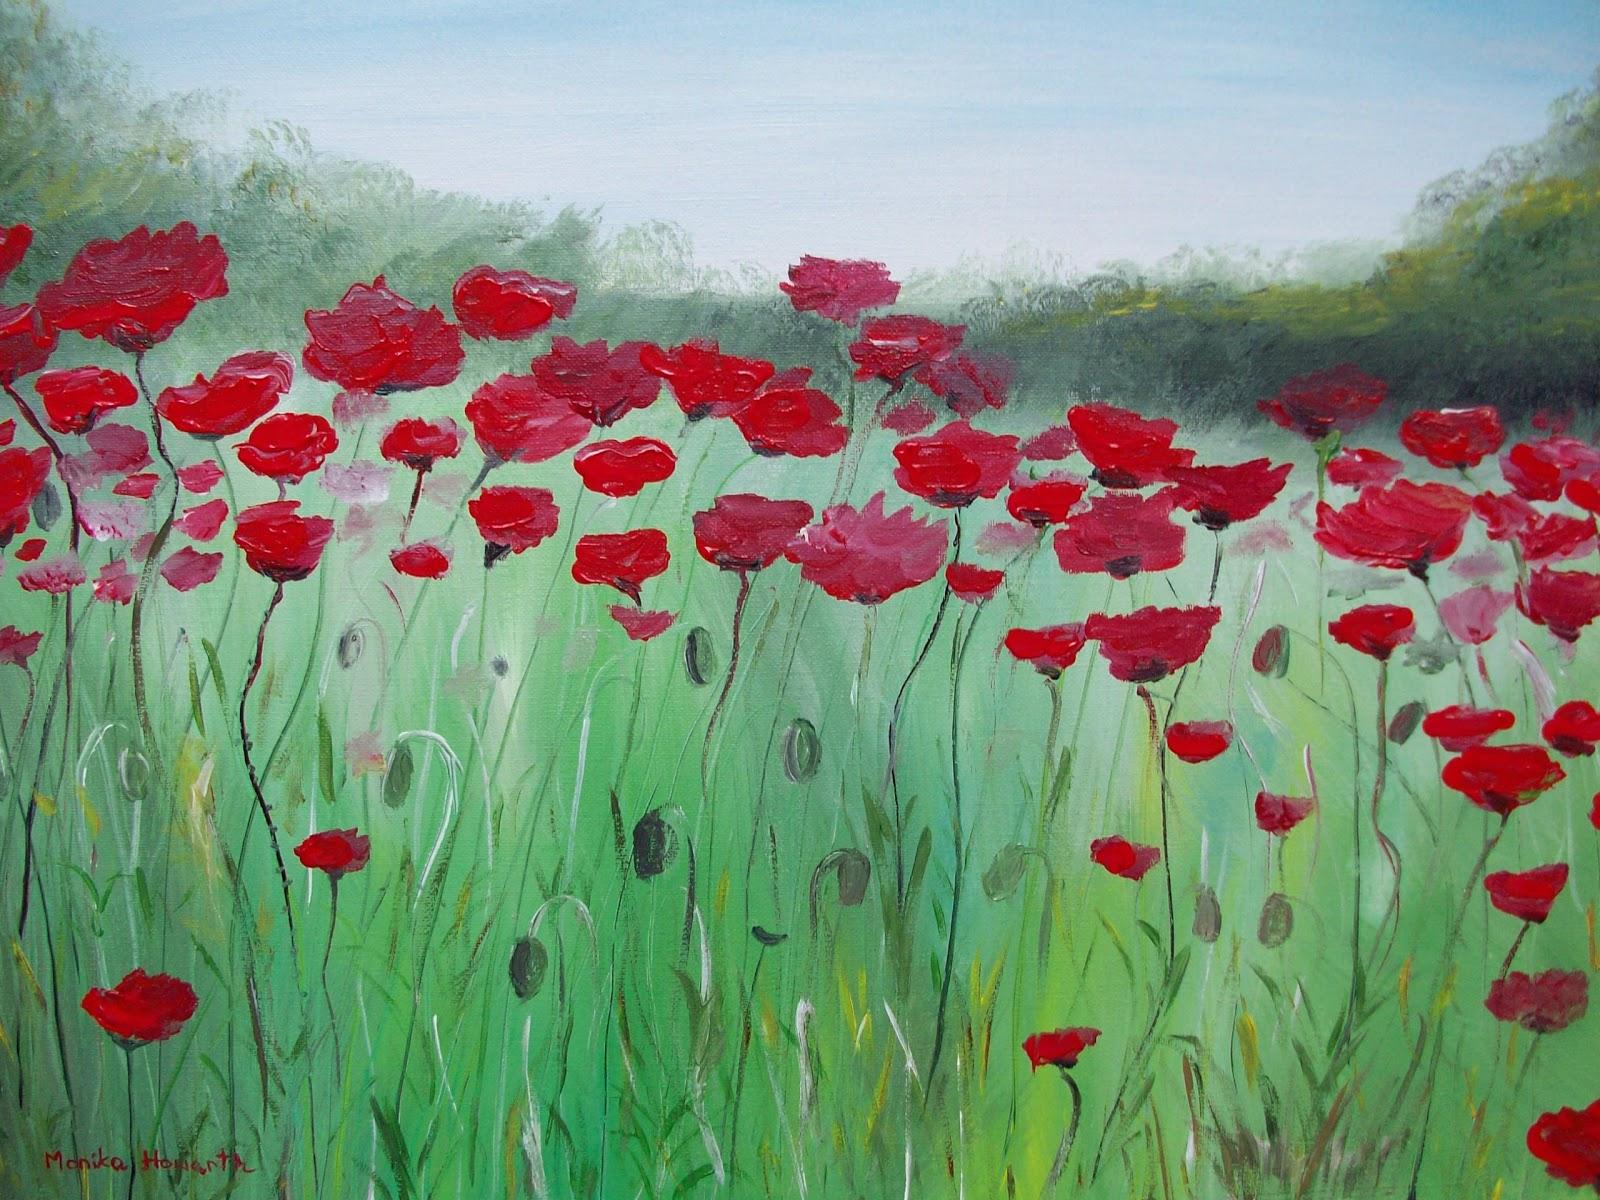 Monika howarth artbymonika for How to paint flowers with acrylics on canvas